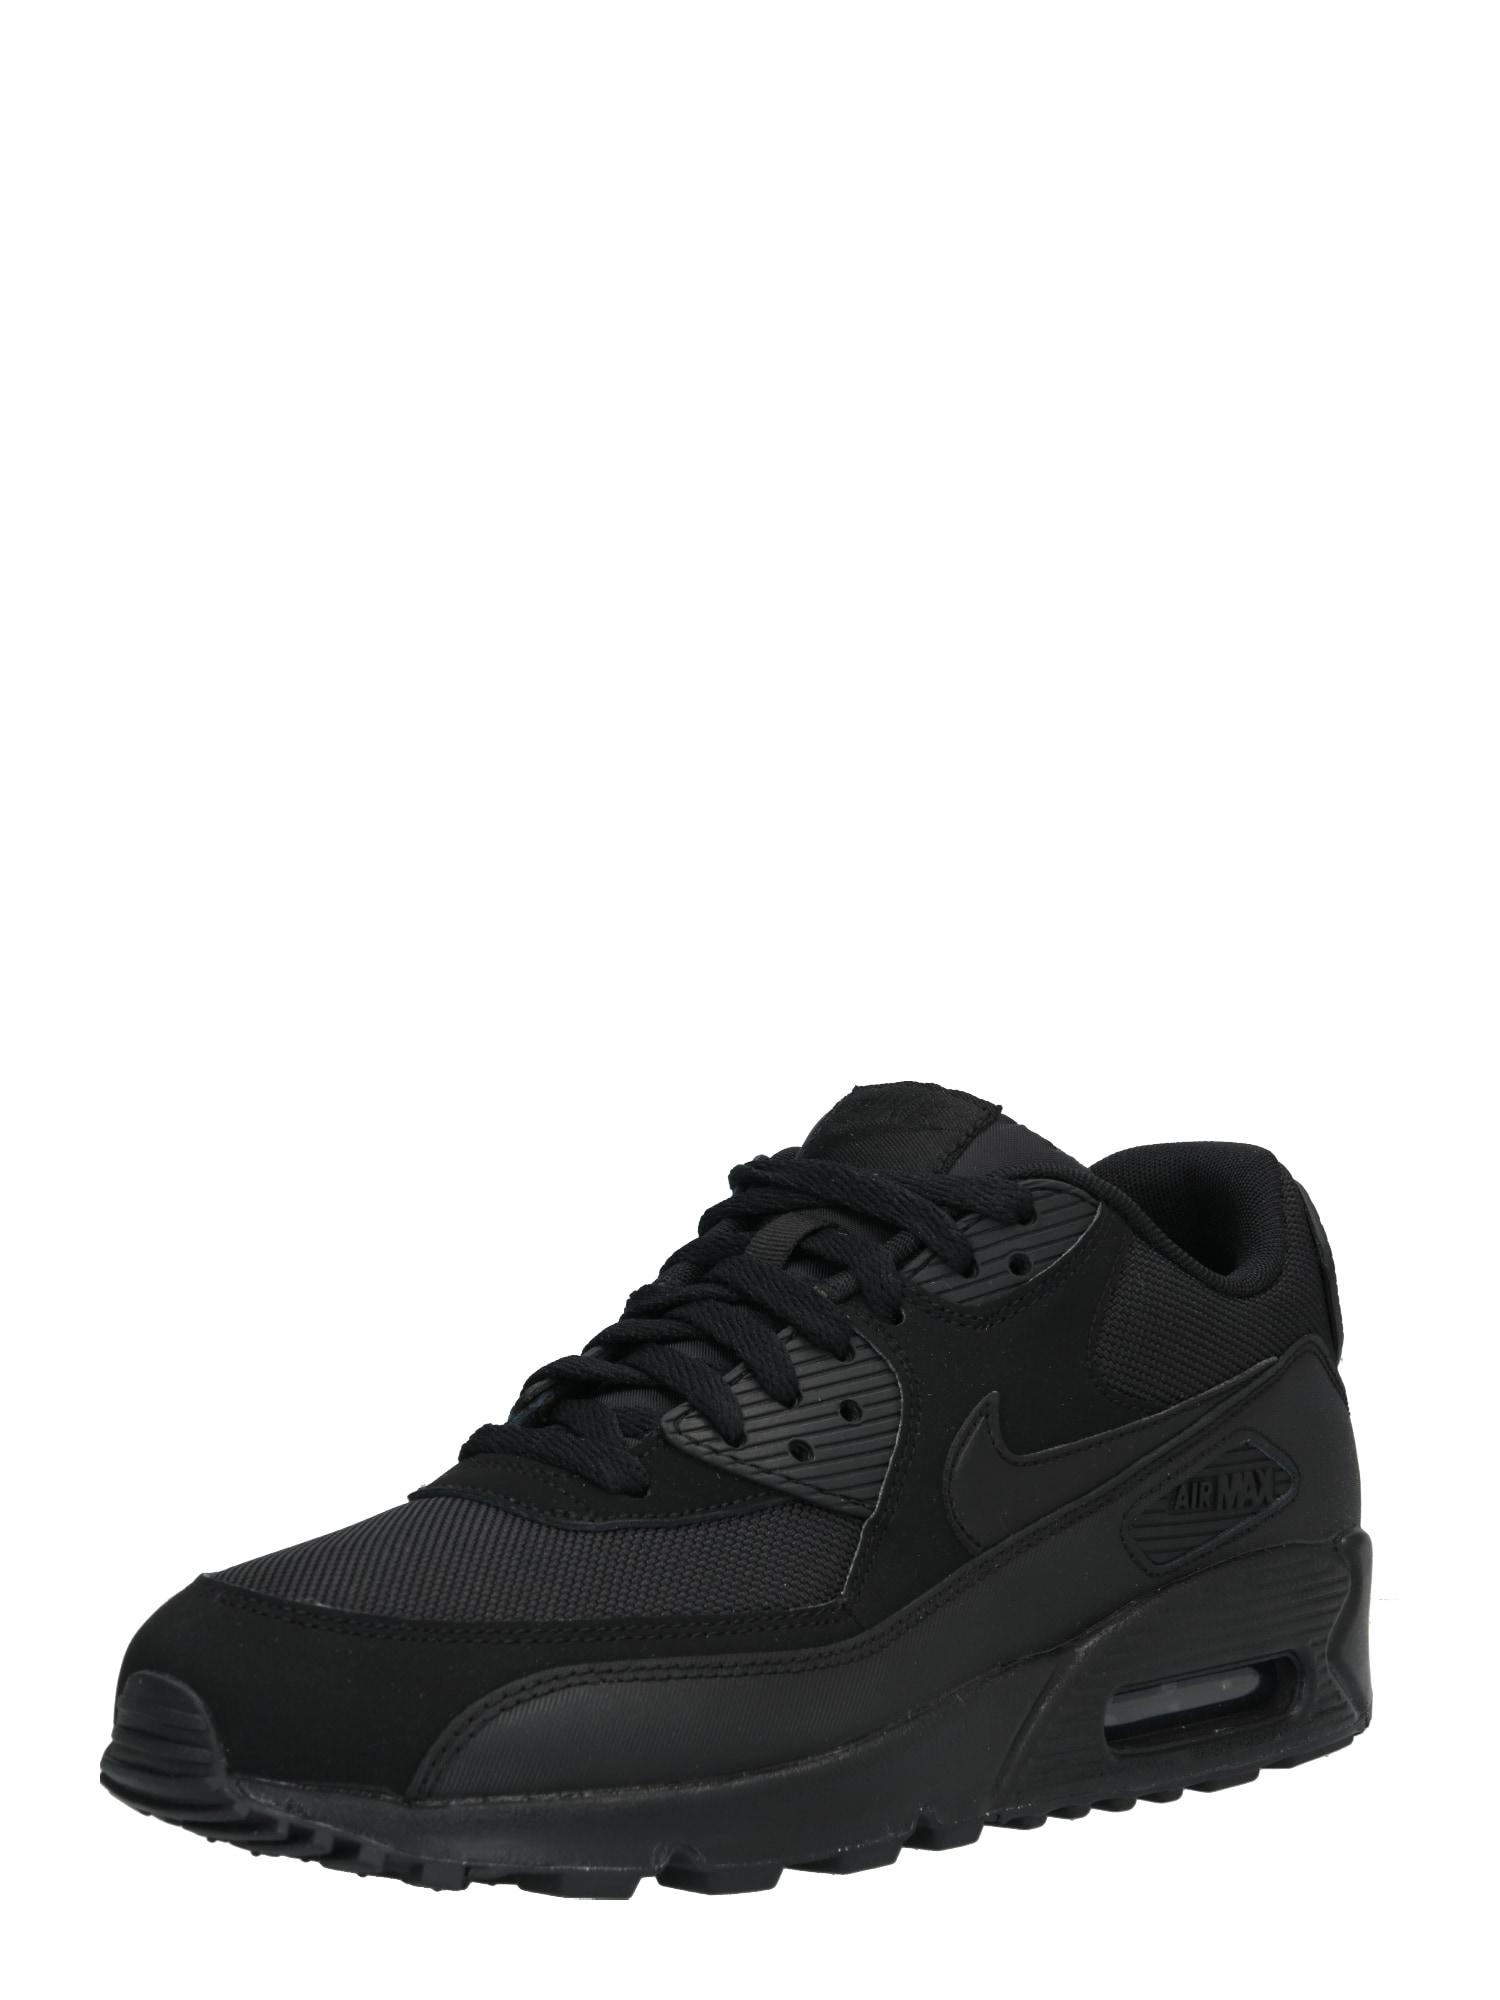 Tenisky Air Max 90 černá Nike Sportswear